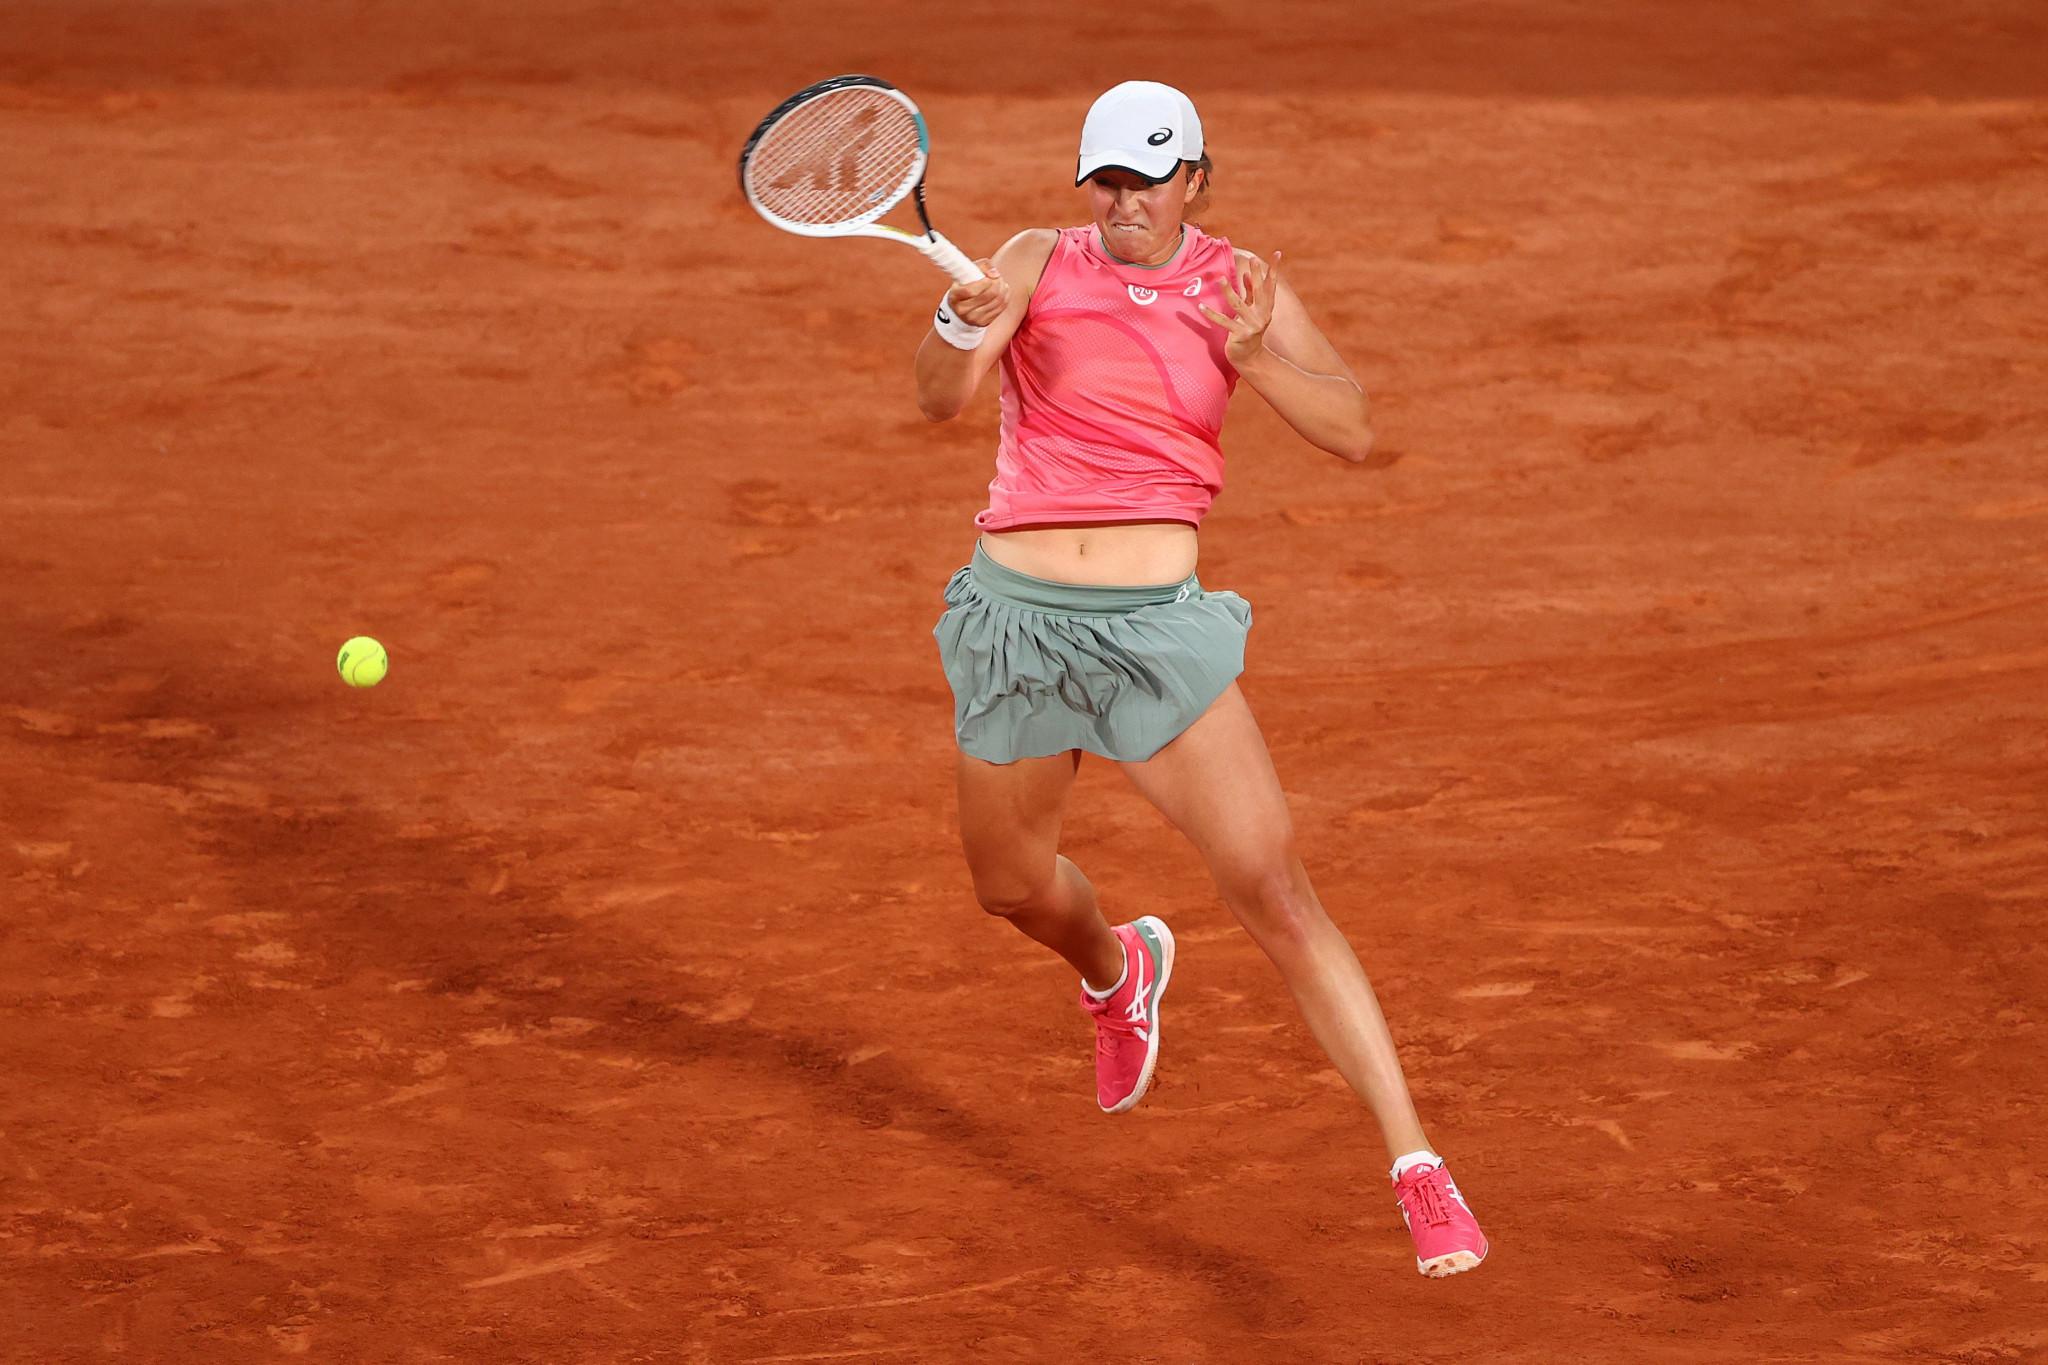 Djokovic battles back to win in five sets as defending women's champion Swiatek advances at French Open